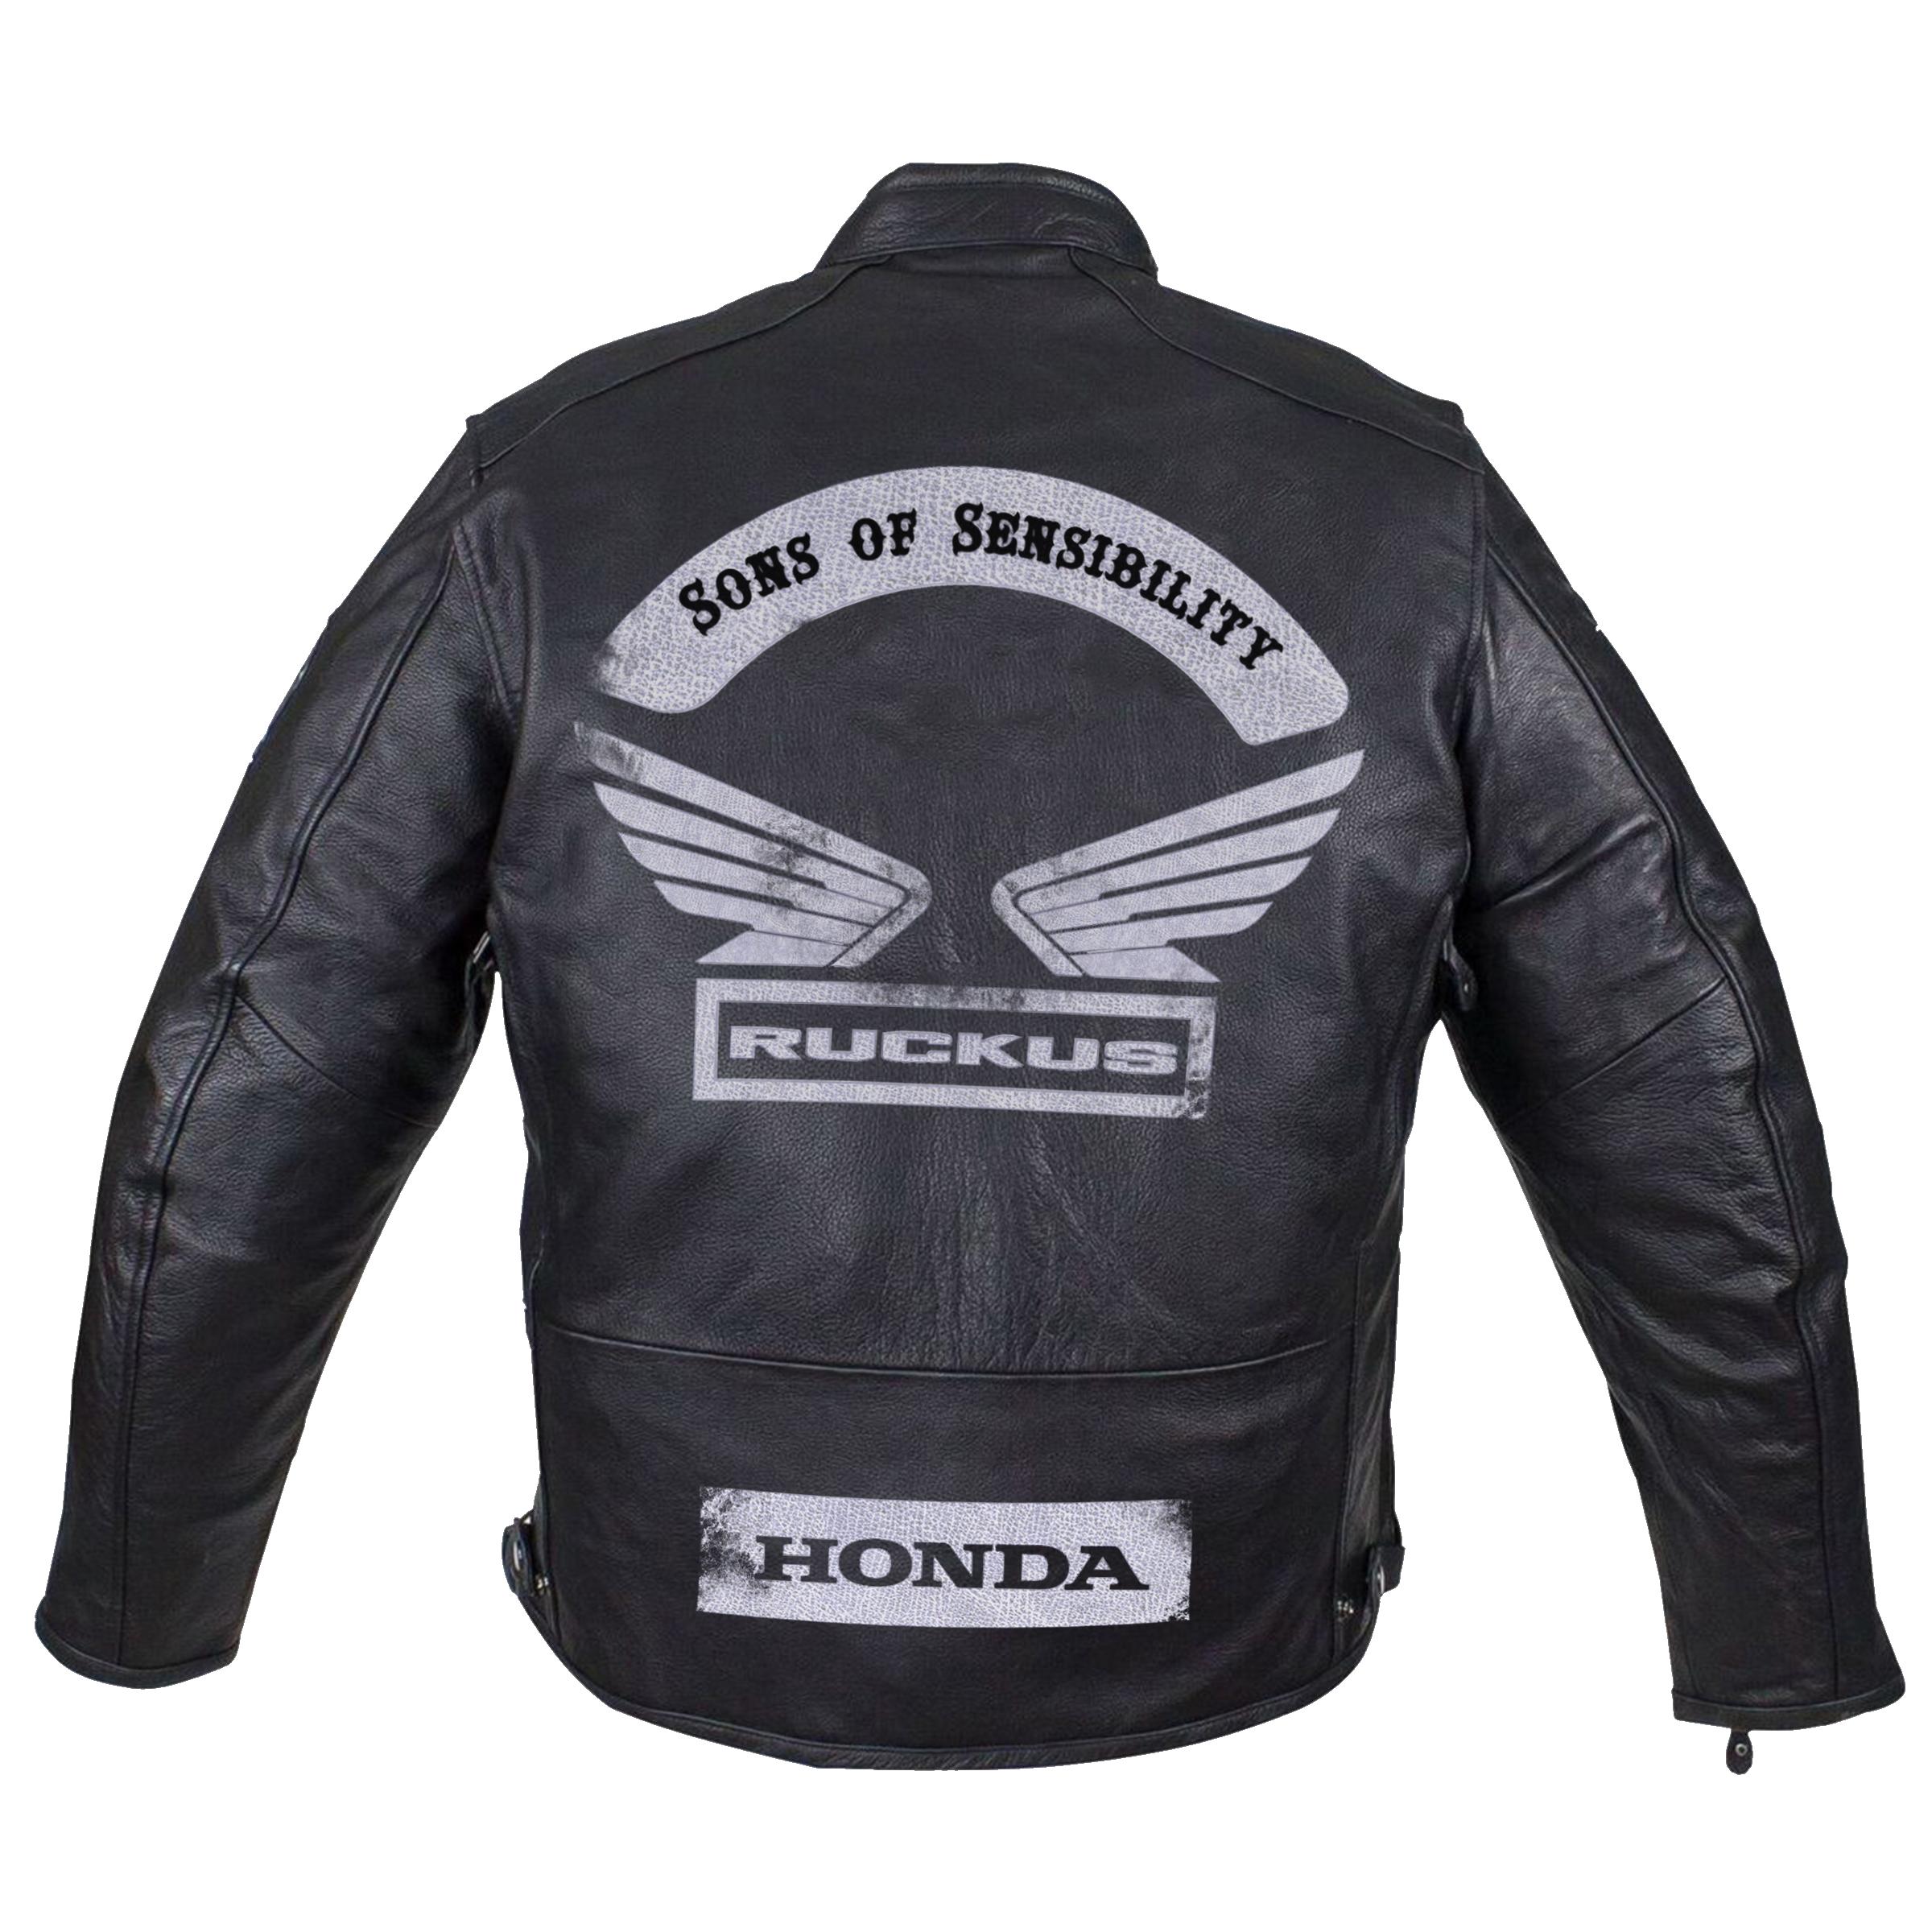 final jacket.png